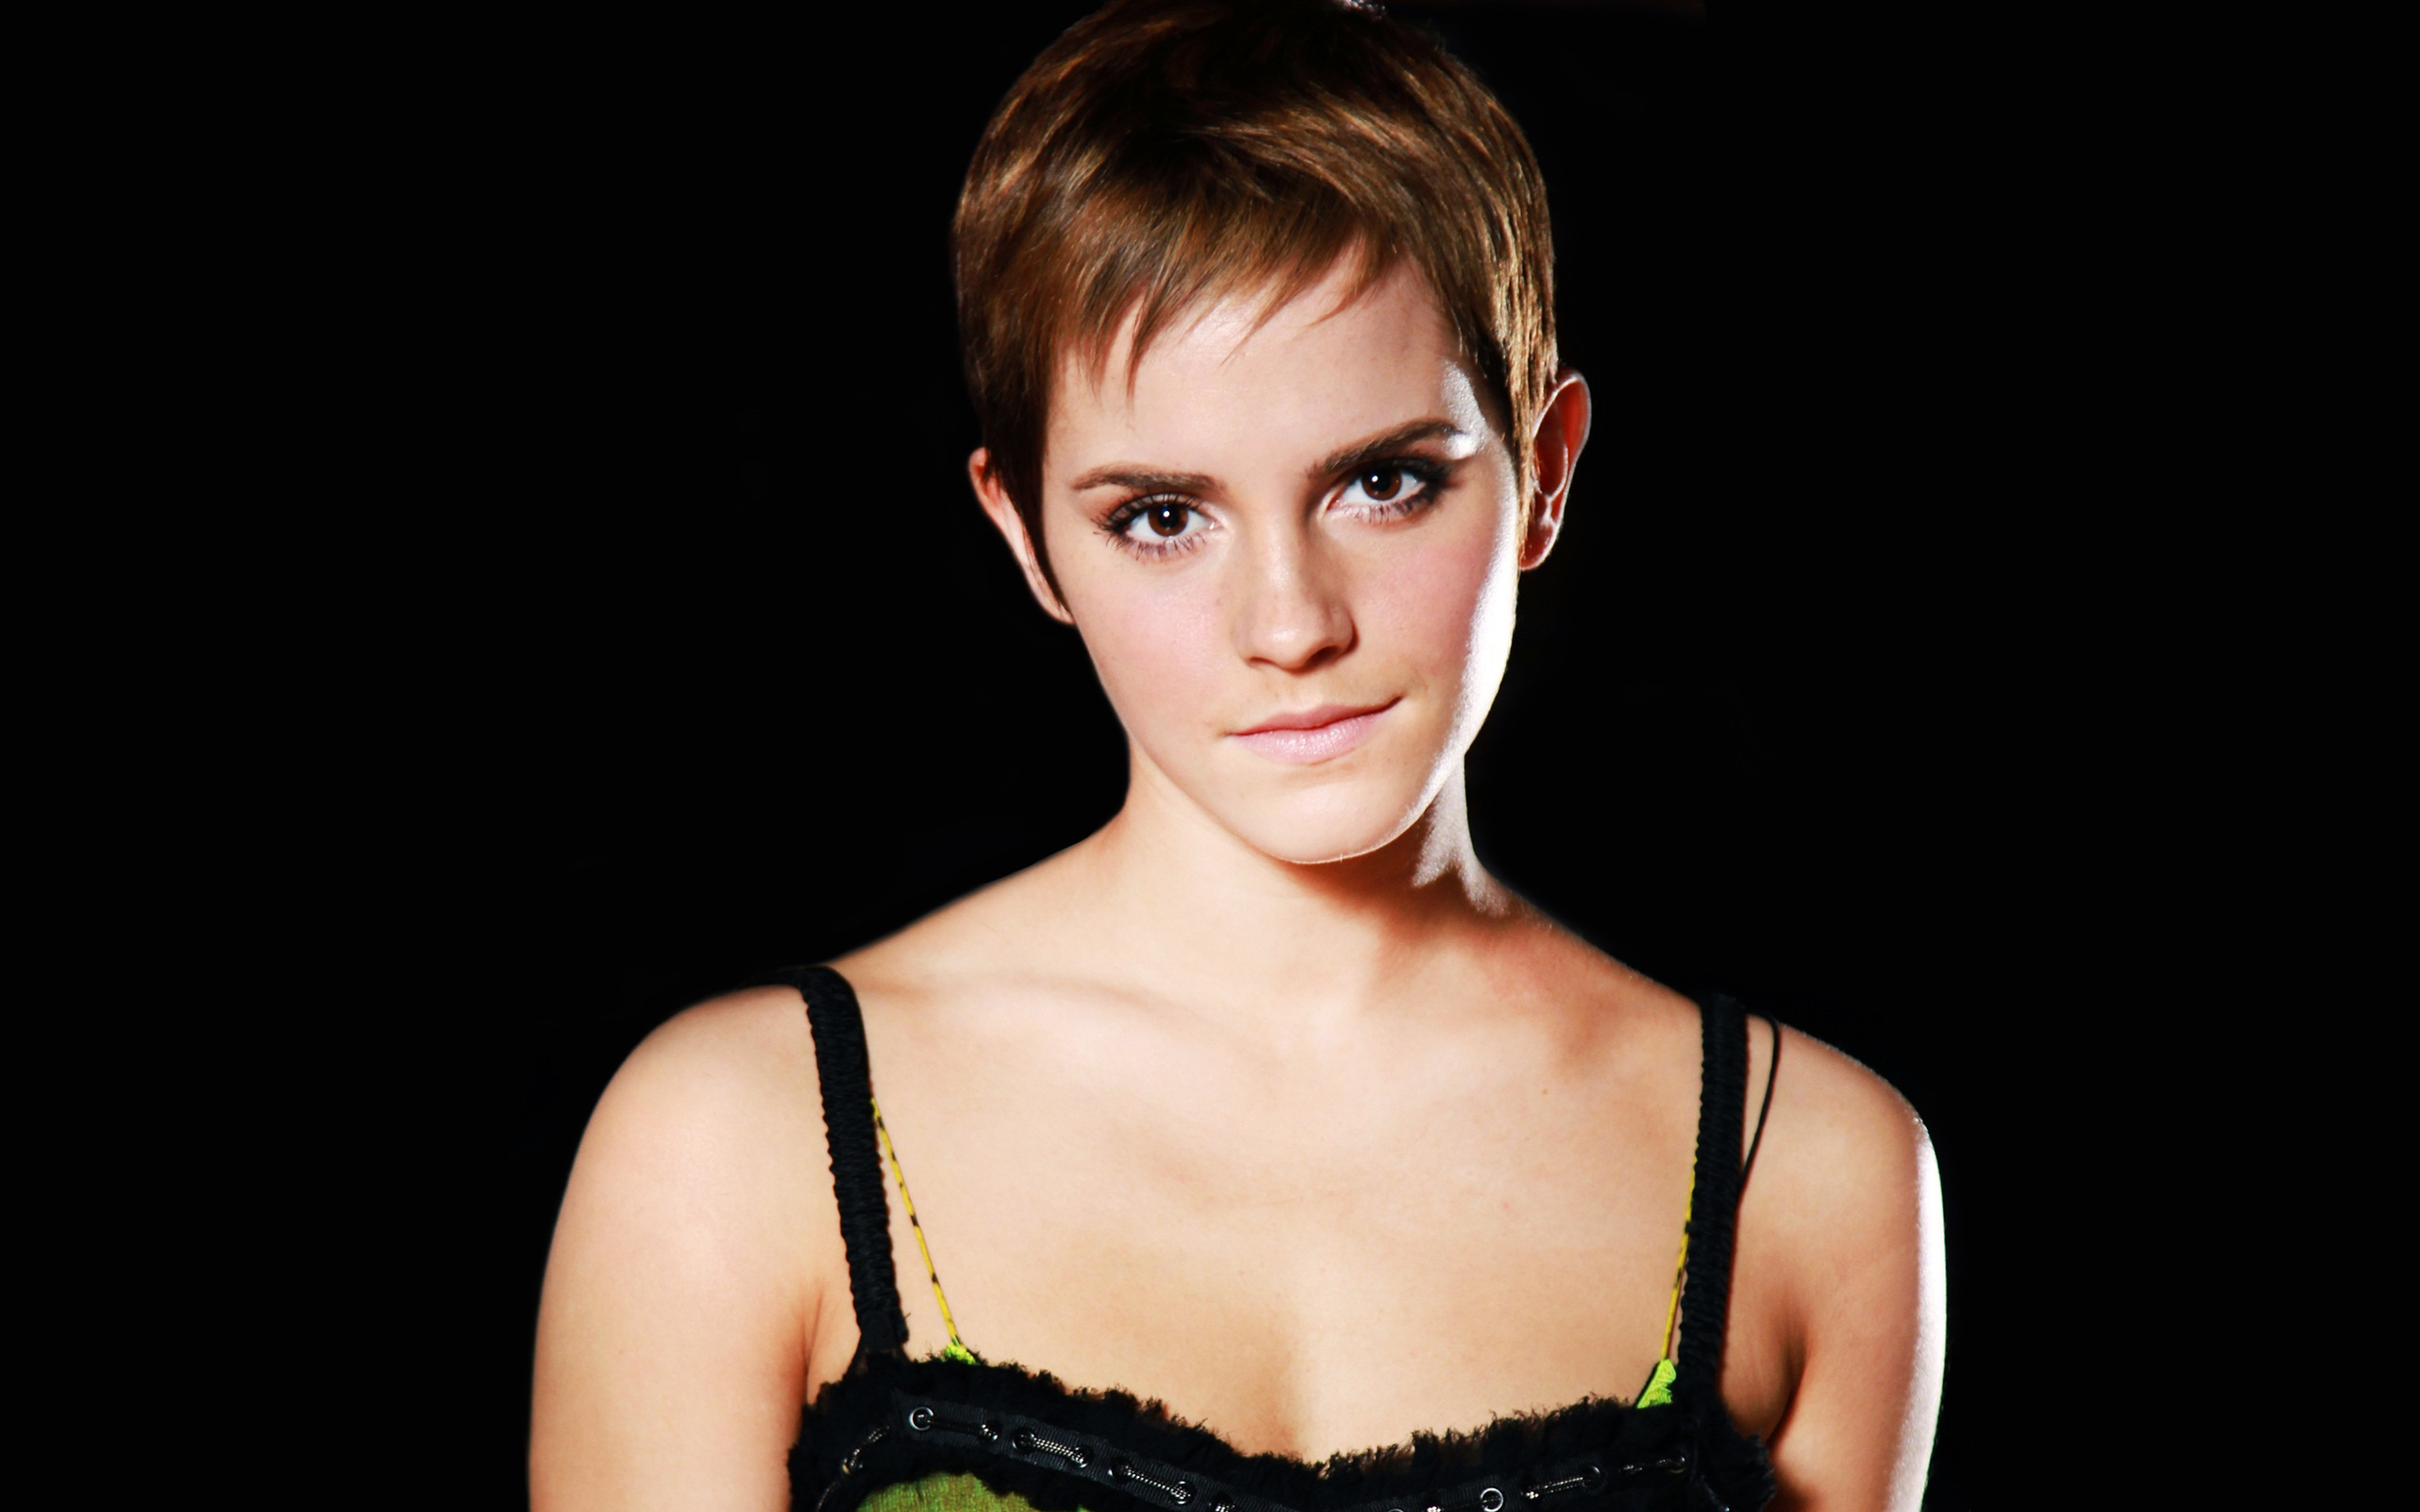 Emma Watson 276 wallpaper